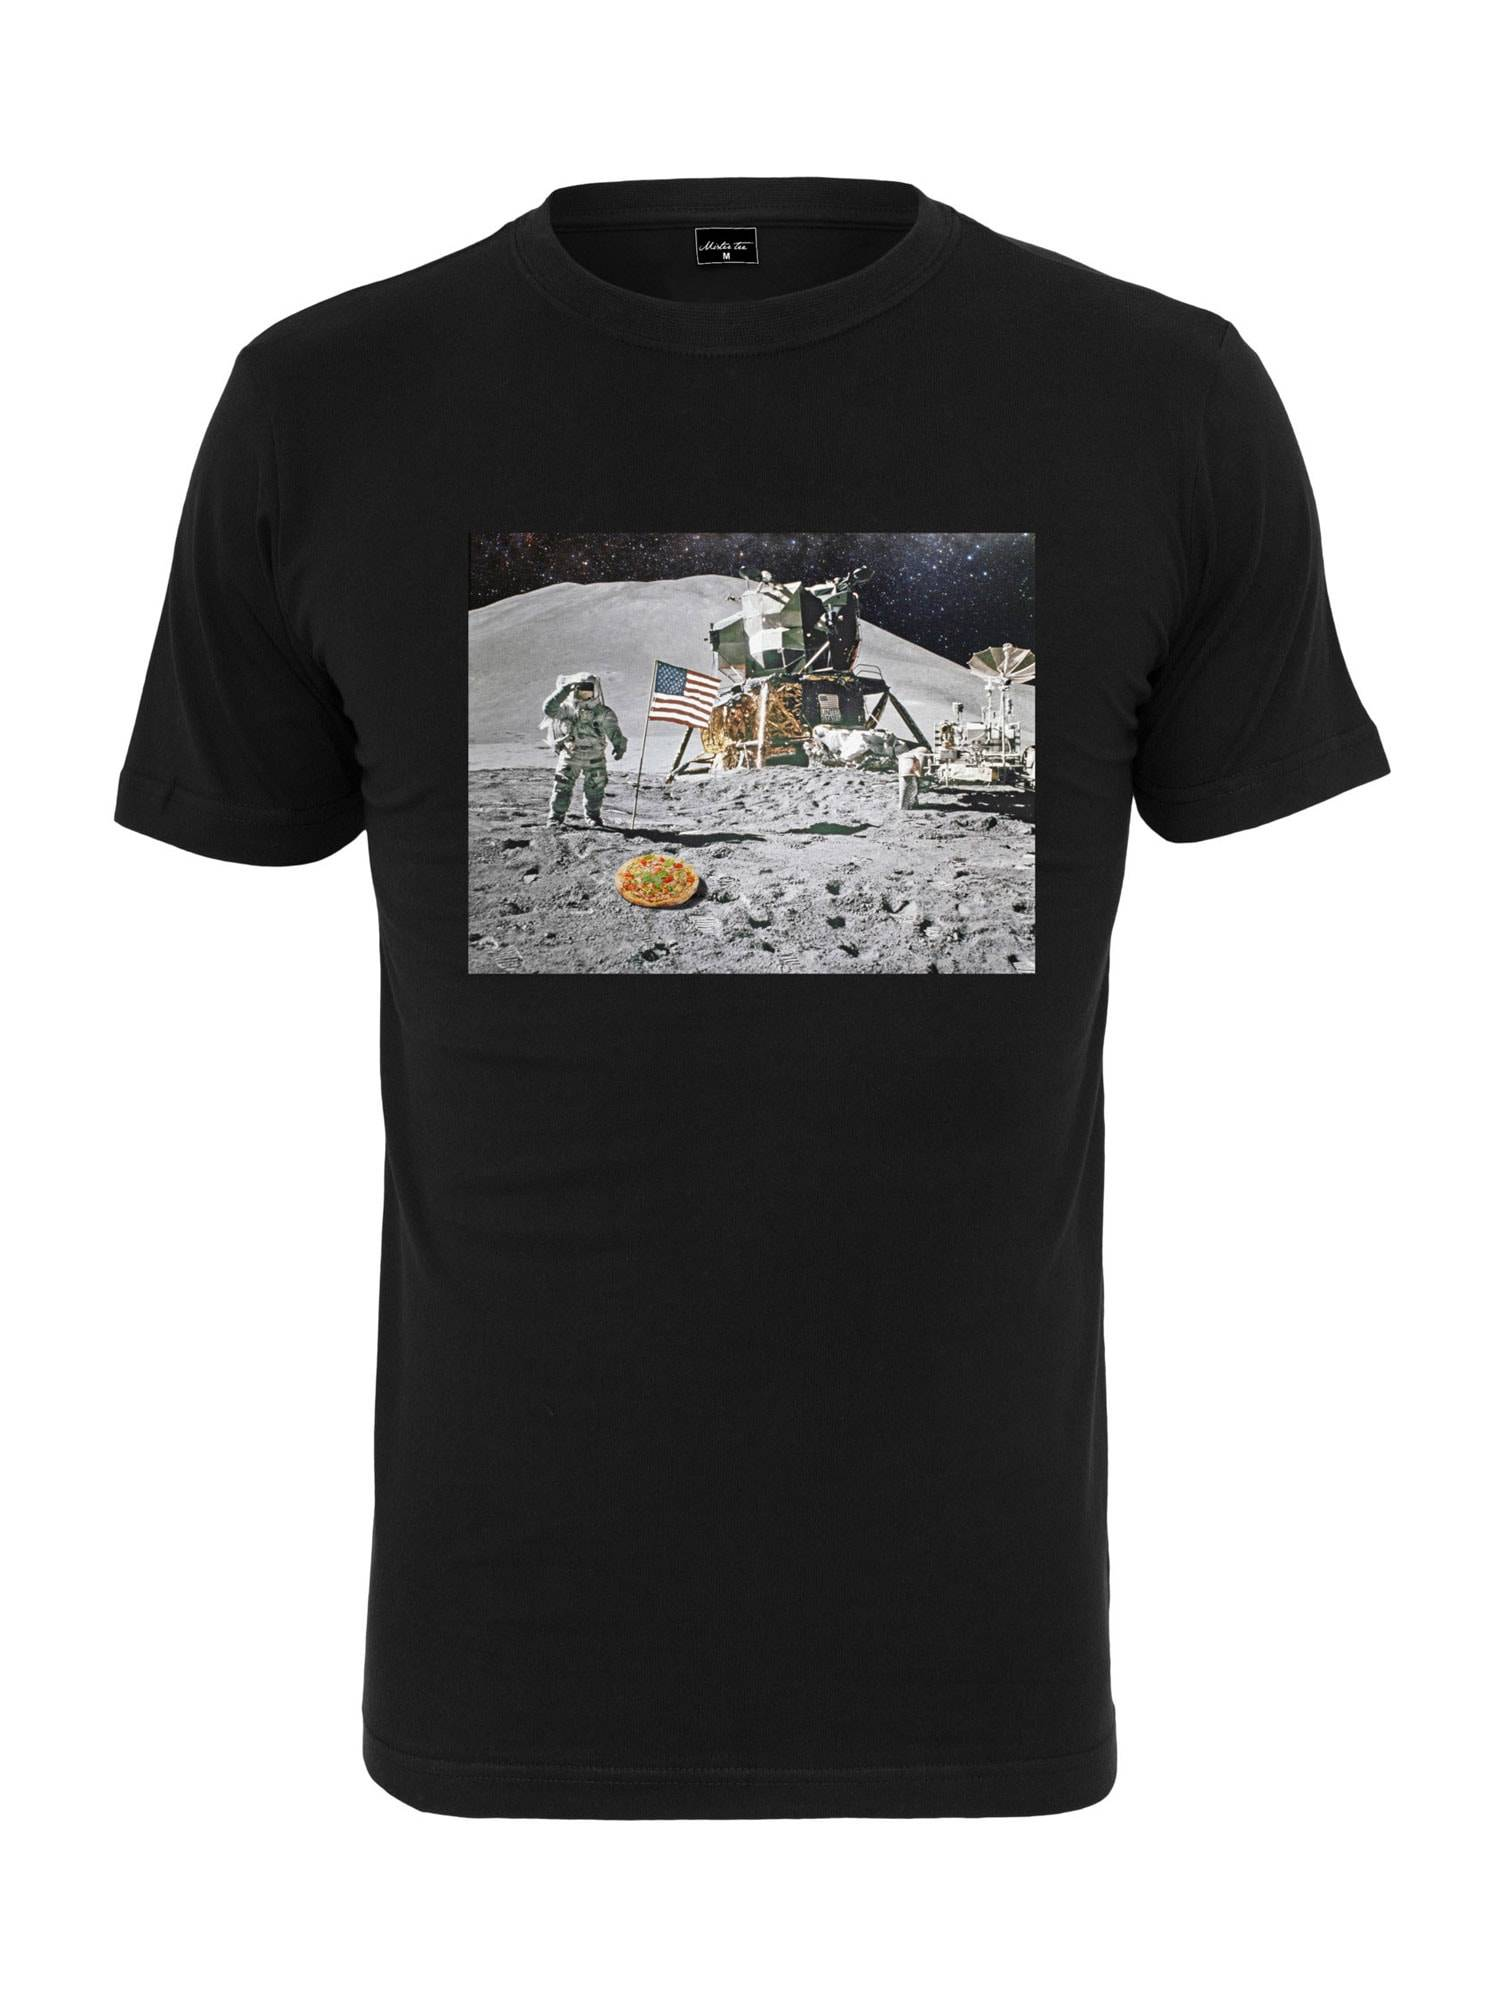 Tee T-Shirt 'Pizza Moon Landing'  - Noir - Taille: XXL - male